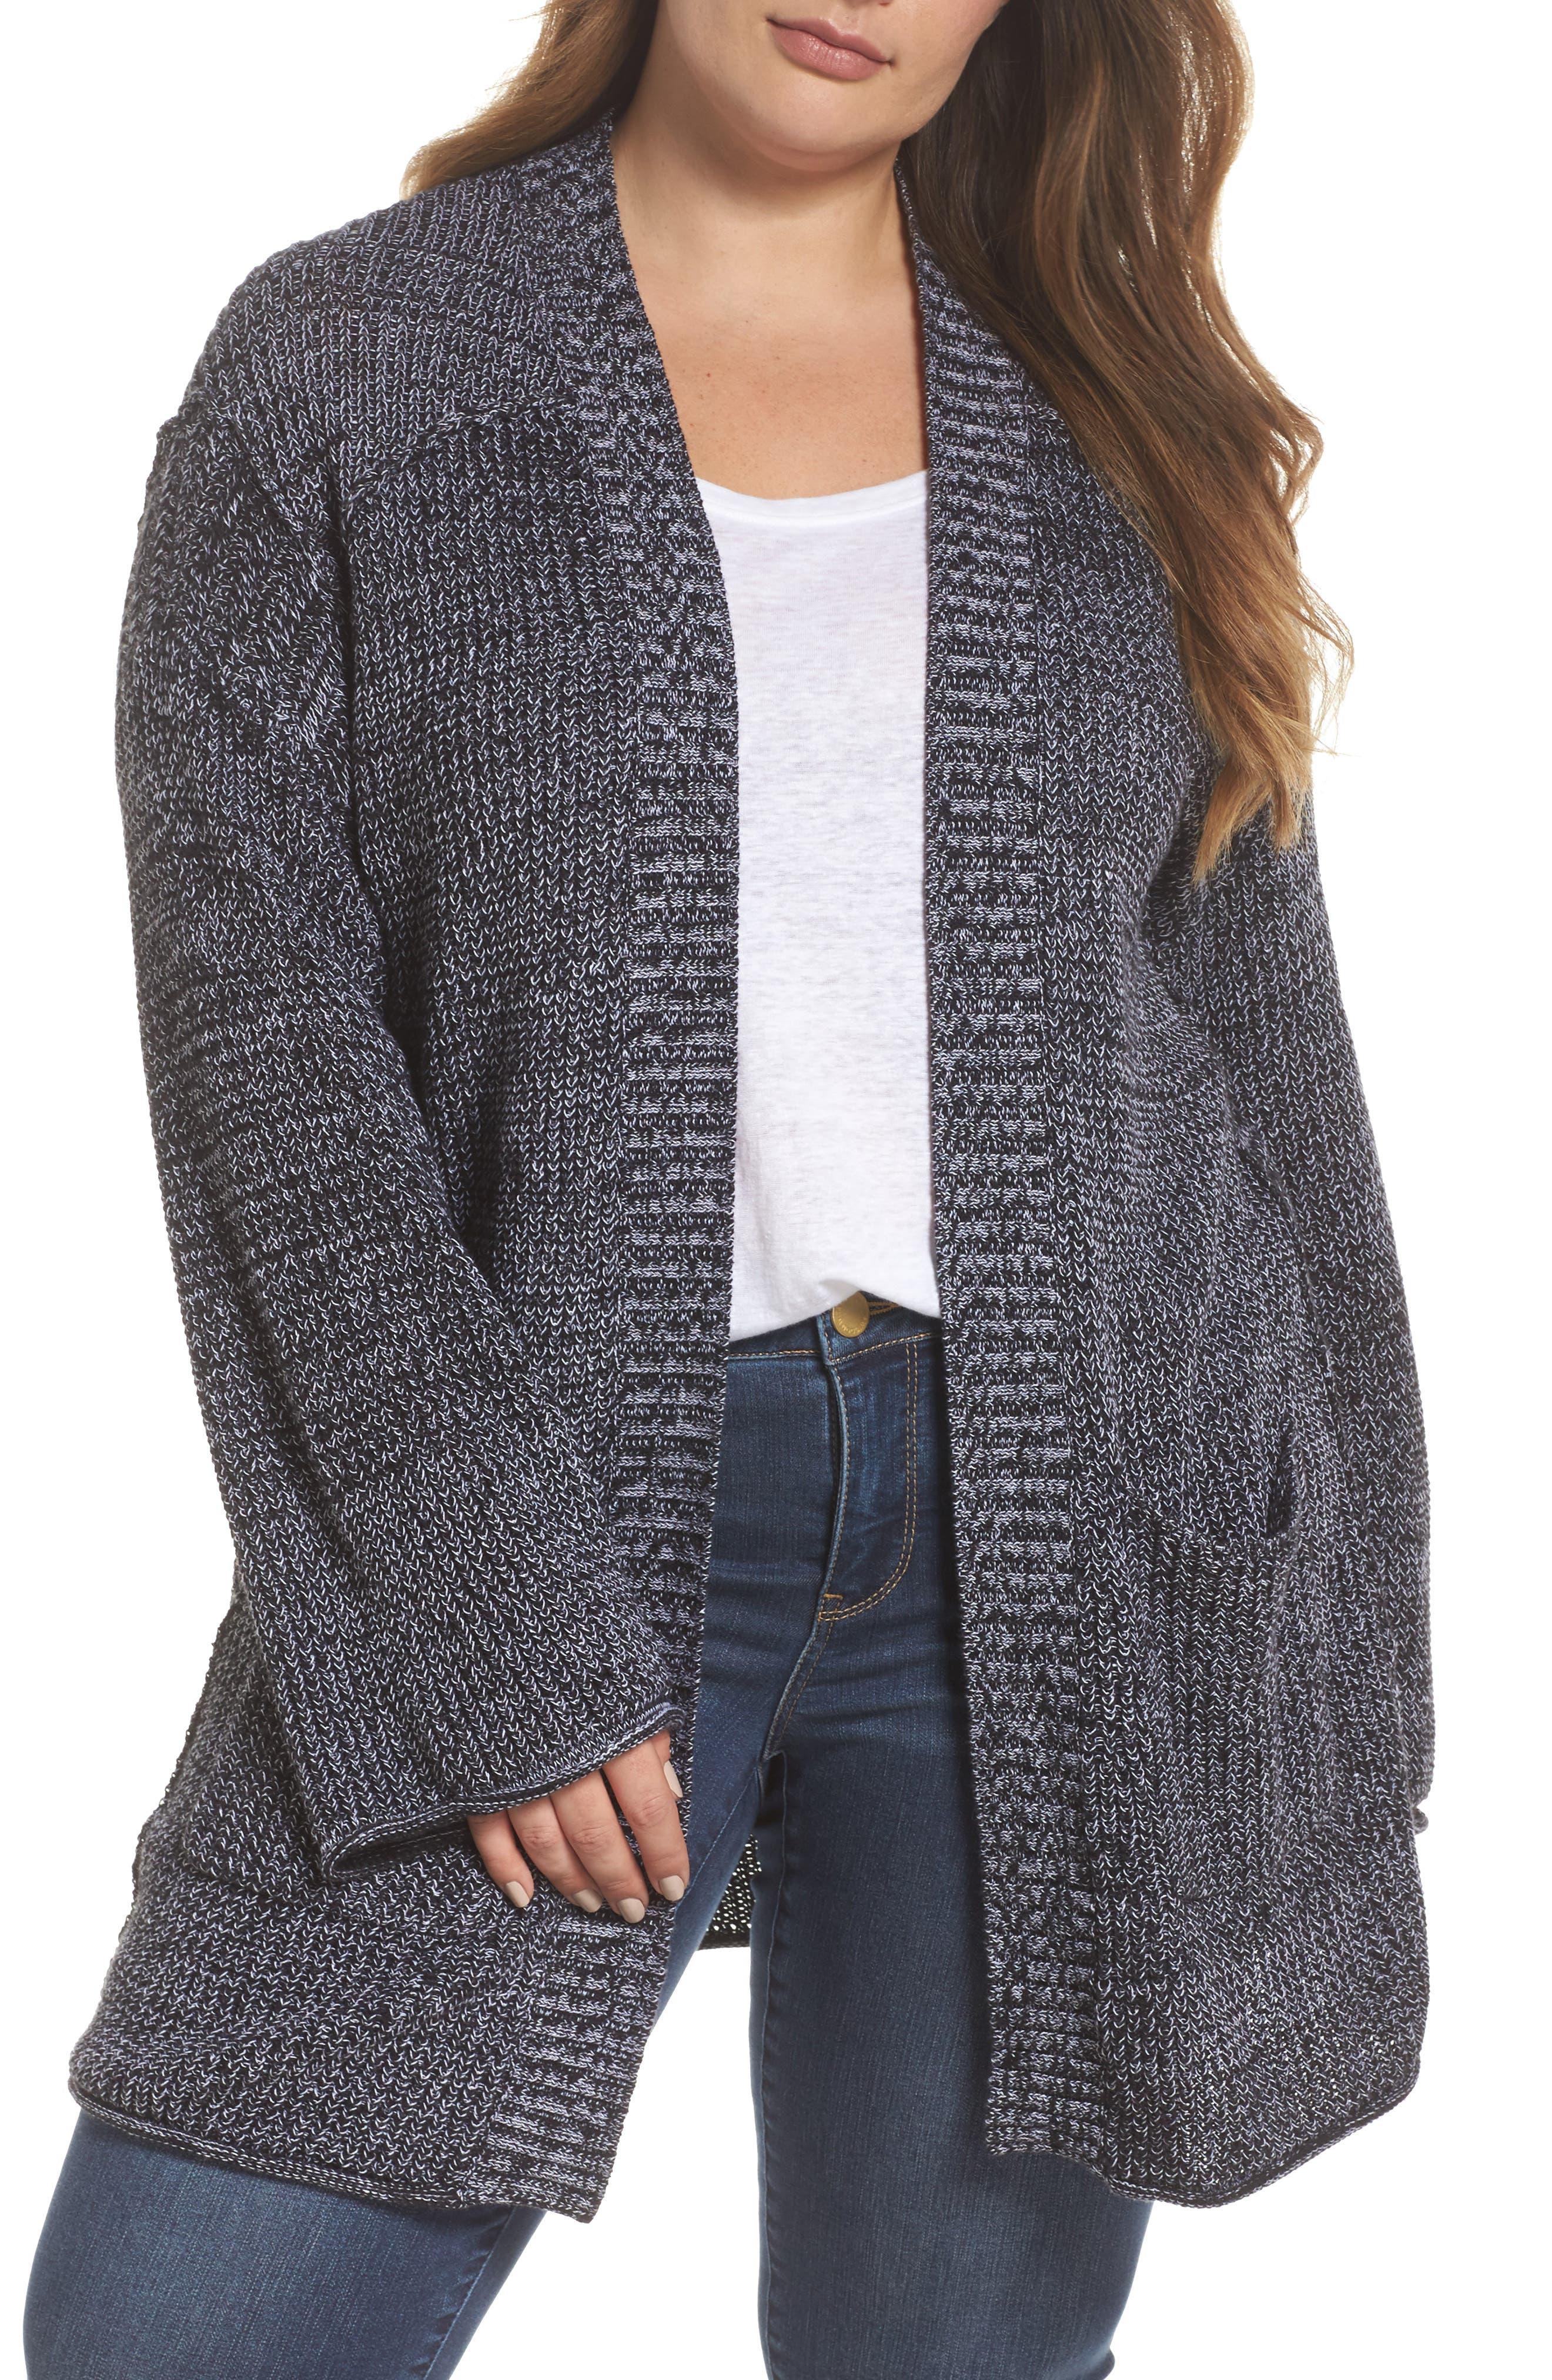 Sweater Knit Cardigan,                             Main thumbnail 1, color,                             001